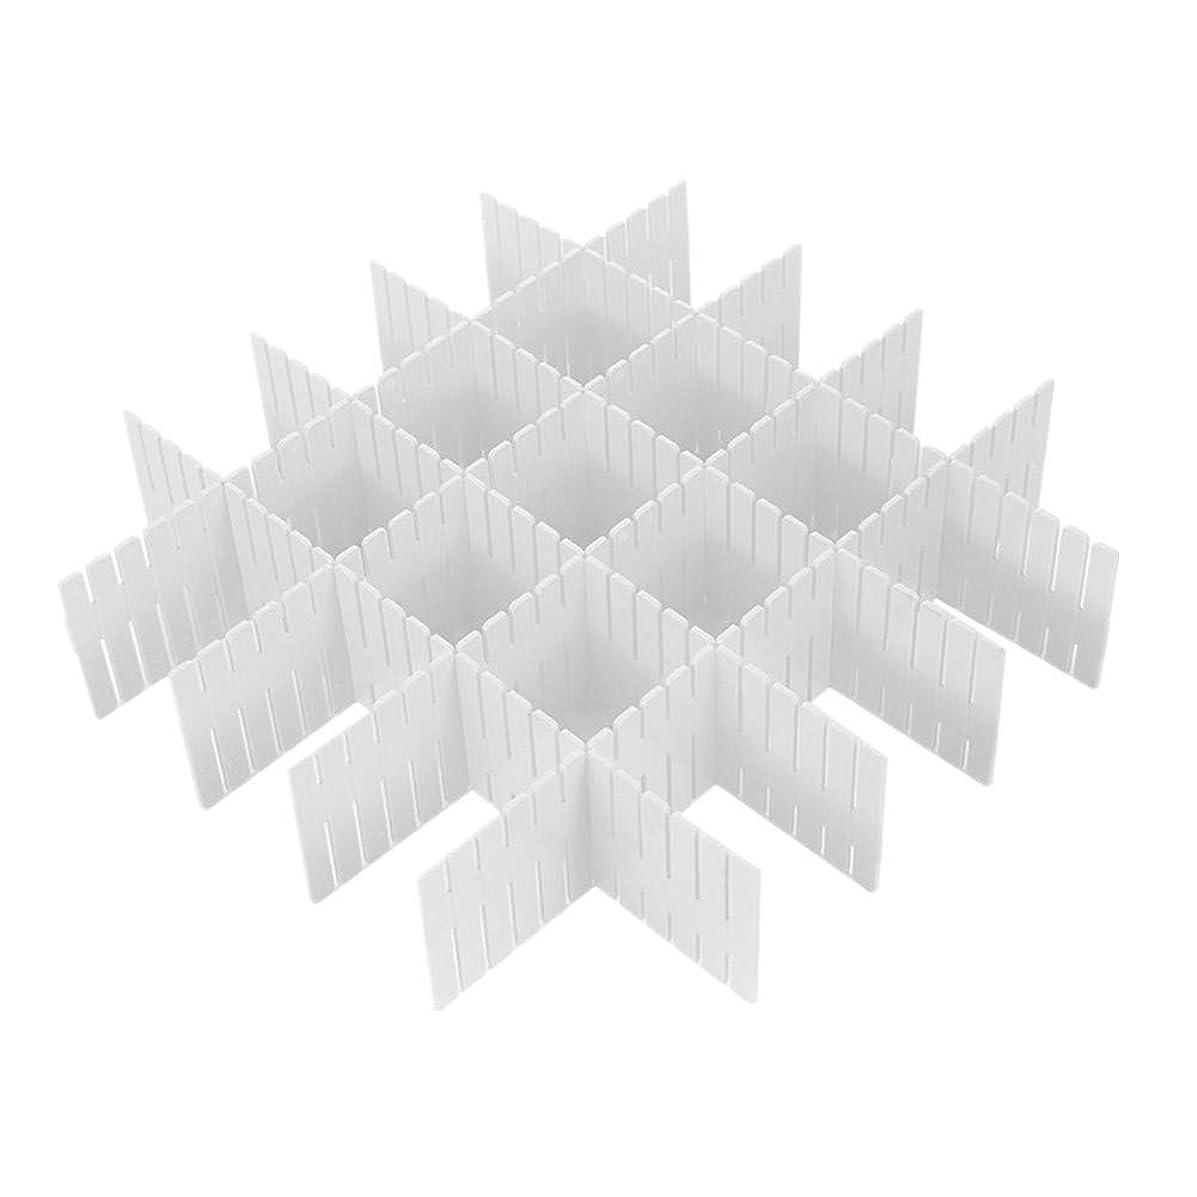 Wefond 8pcs DIY Plastic Drawer Organizer Adjustable Drawer Dividers for Home Tidy Closet, Socks, Underwear, office school supplies, kitchen utensil tools (White)